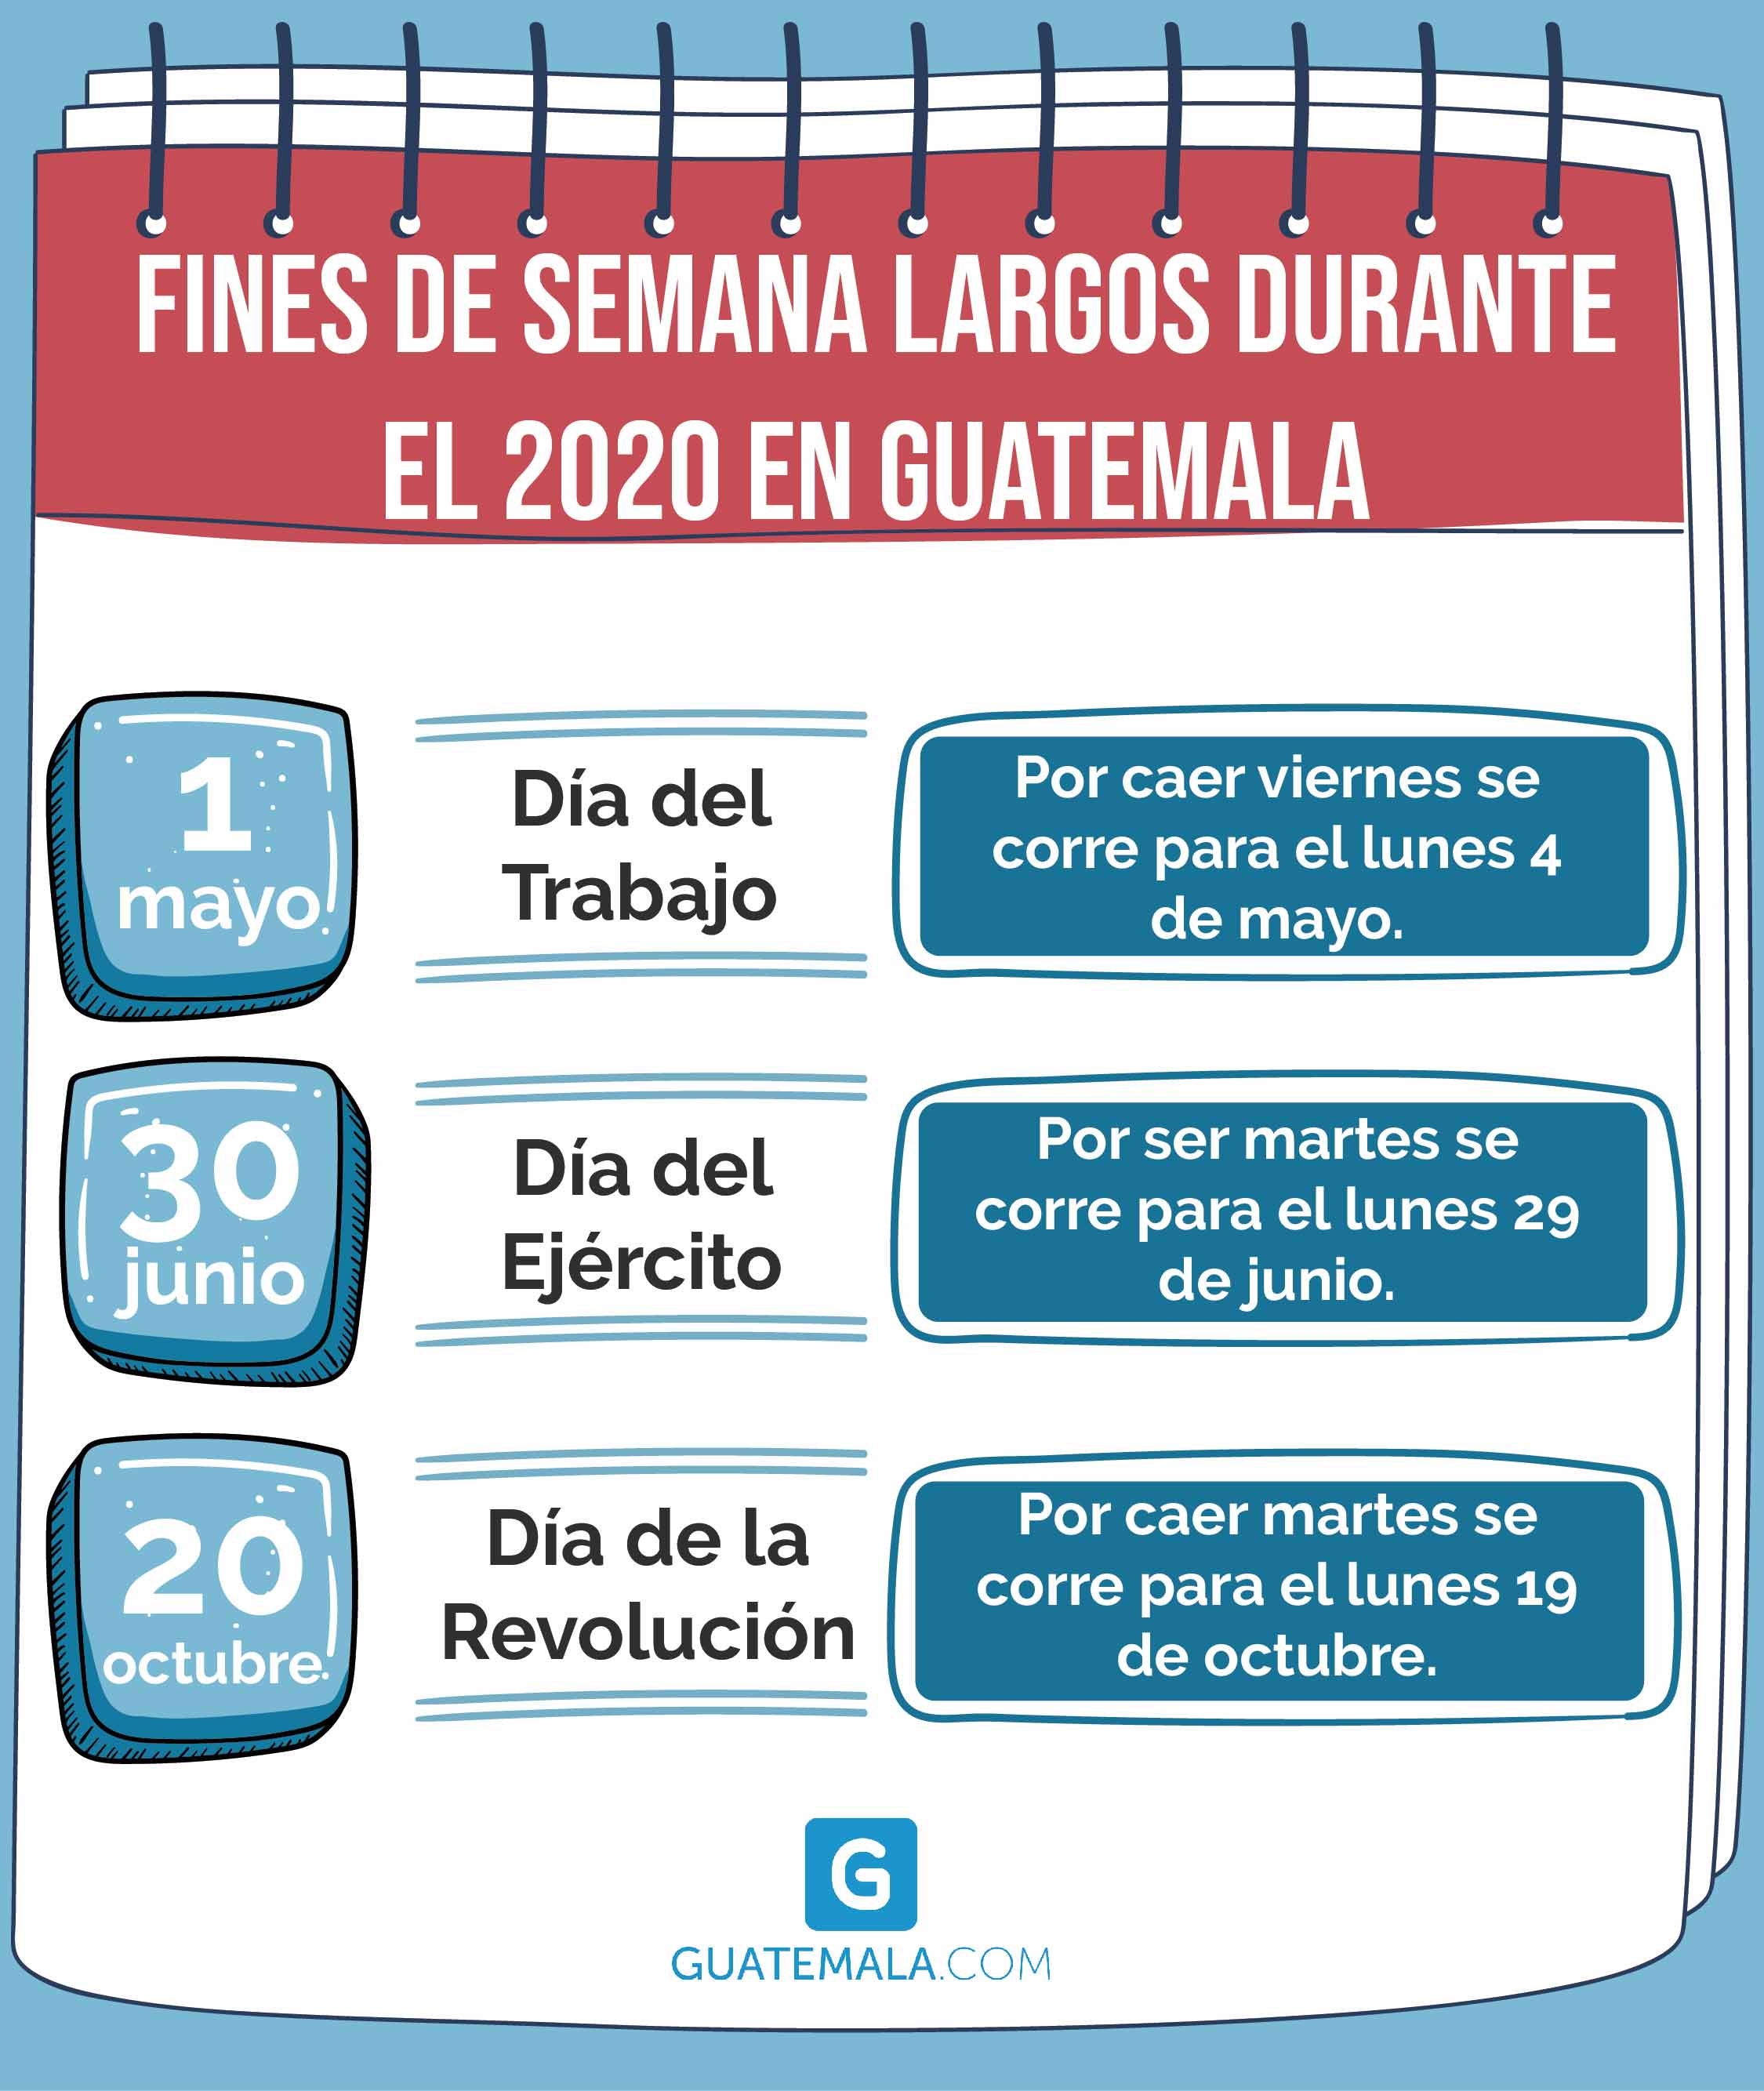 Fines de semana largos del 2020 en Guatemala